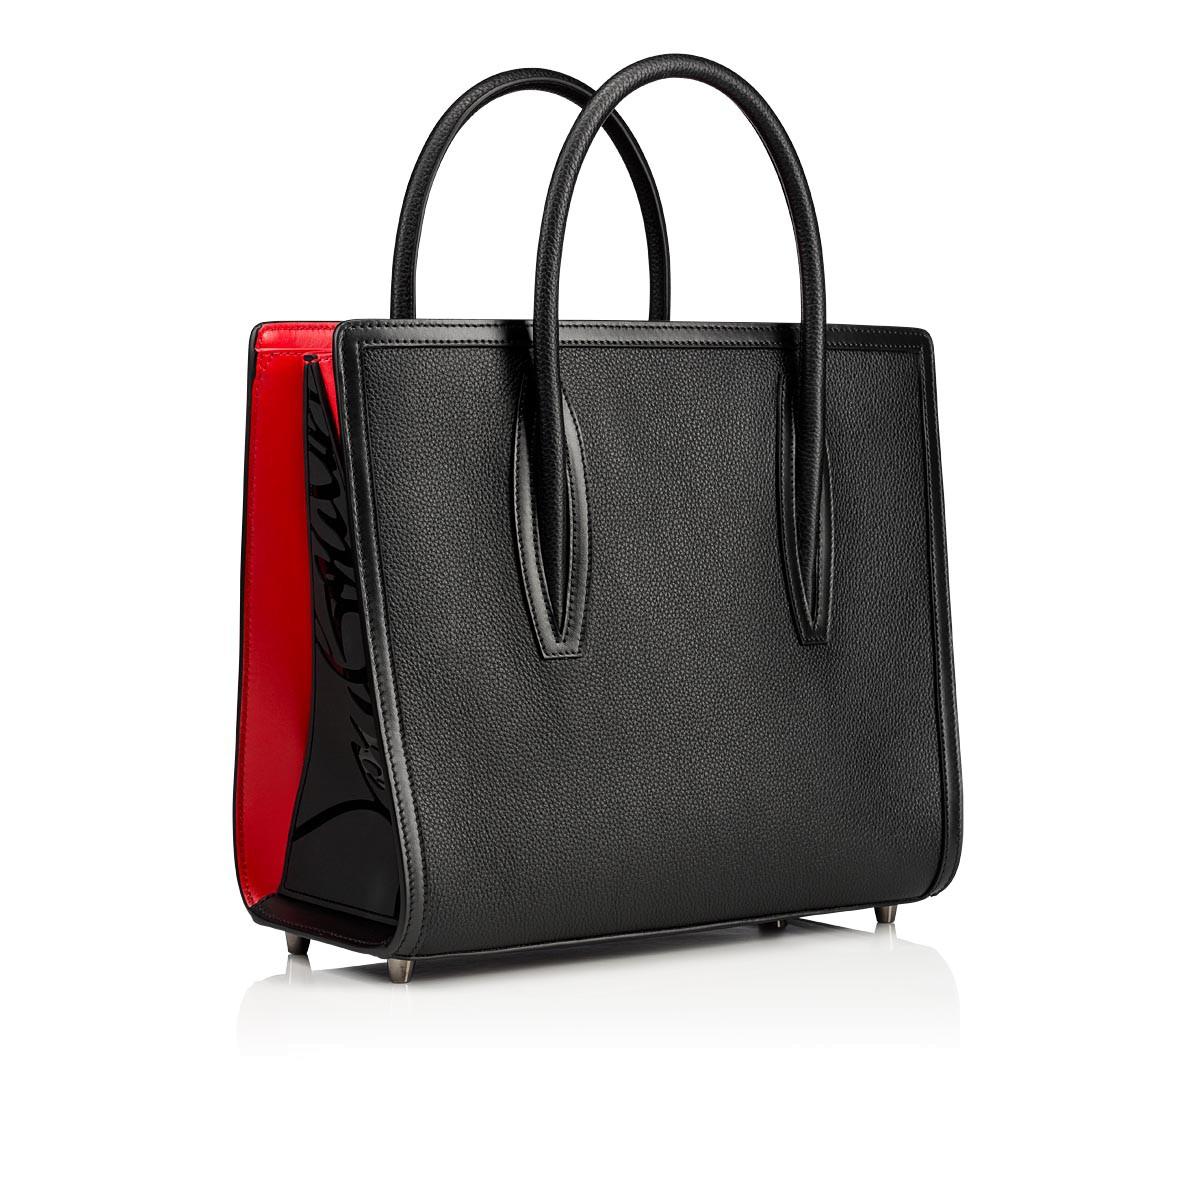 Bags - Paloma S Medium - Christian Louboutin